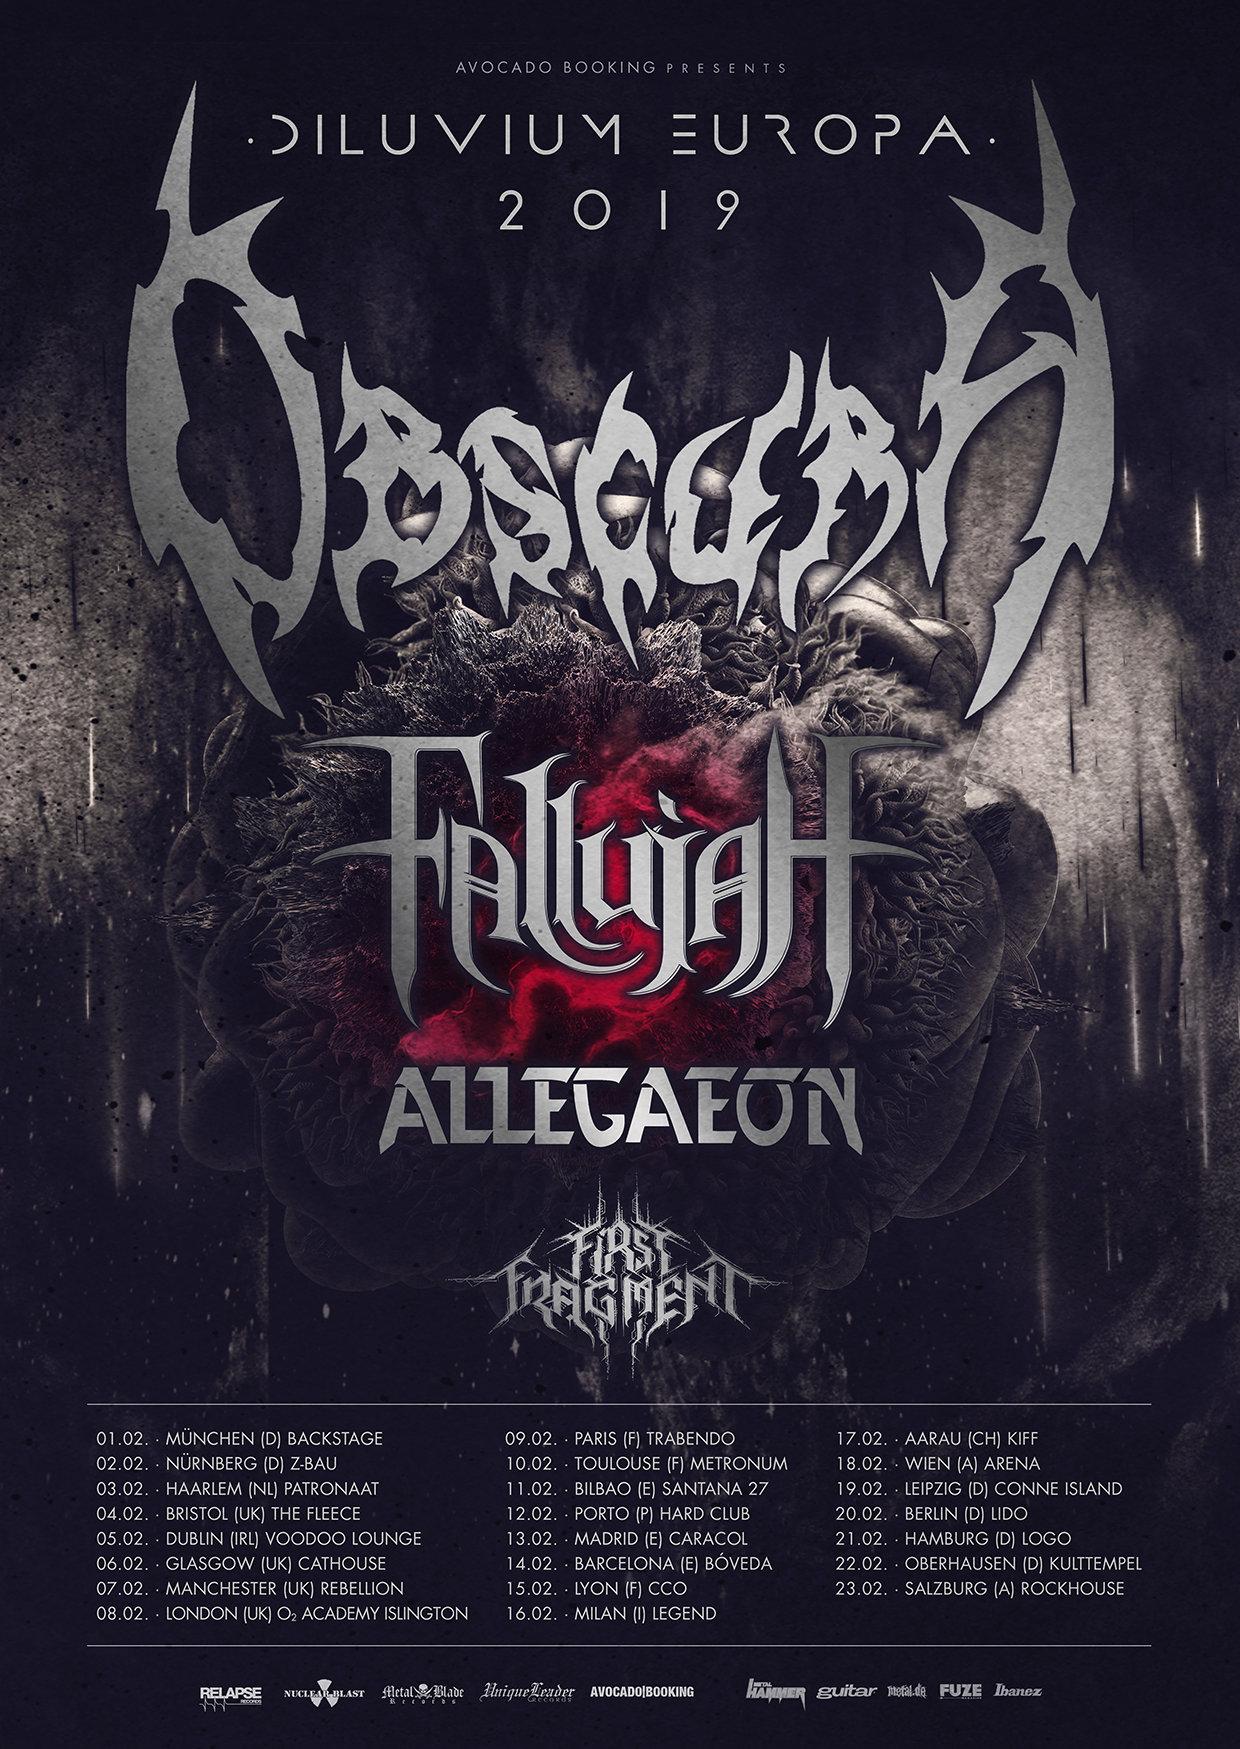 Obscura - Diluvium Europa Tour 2019